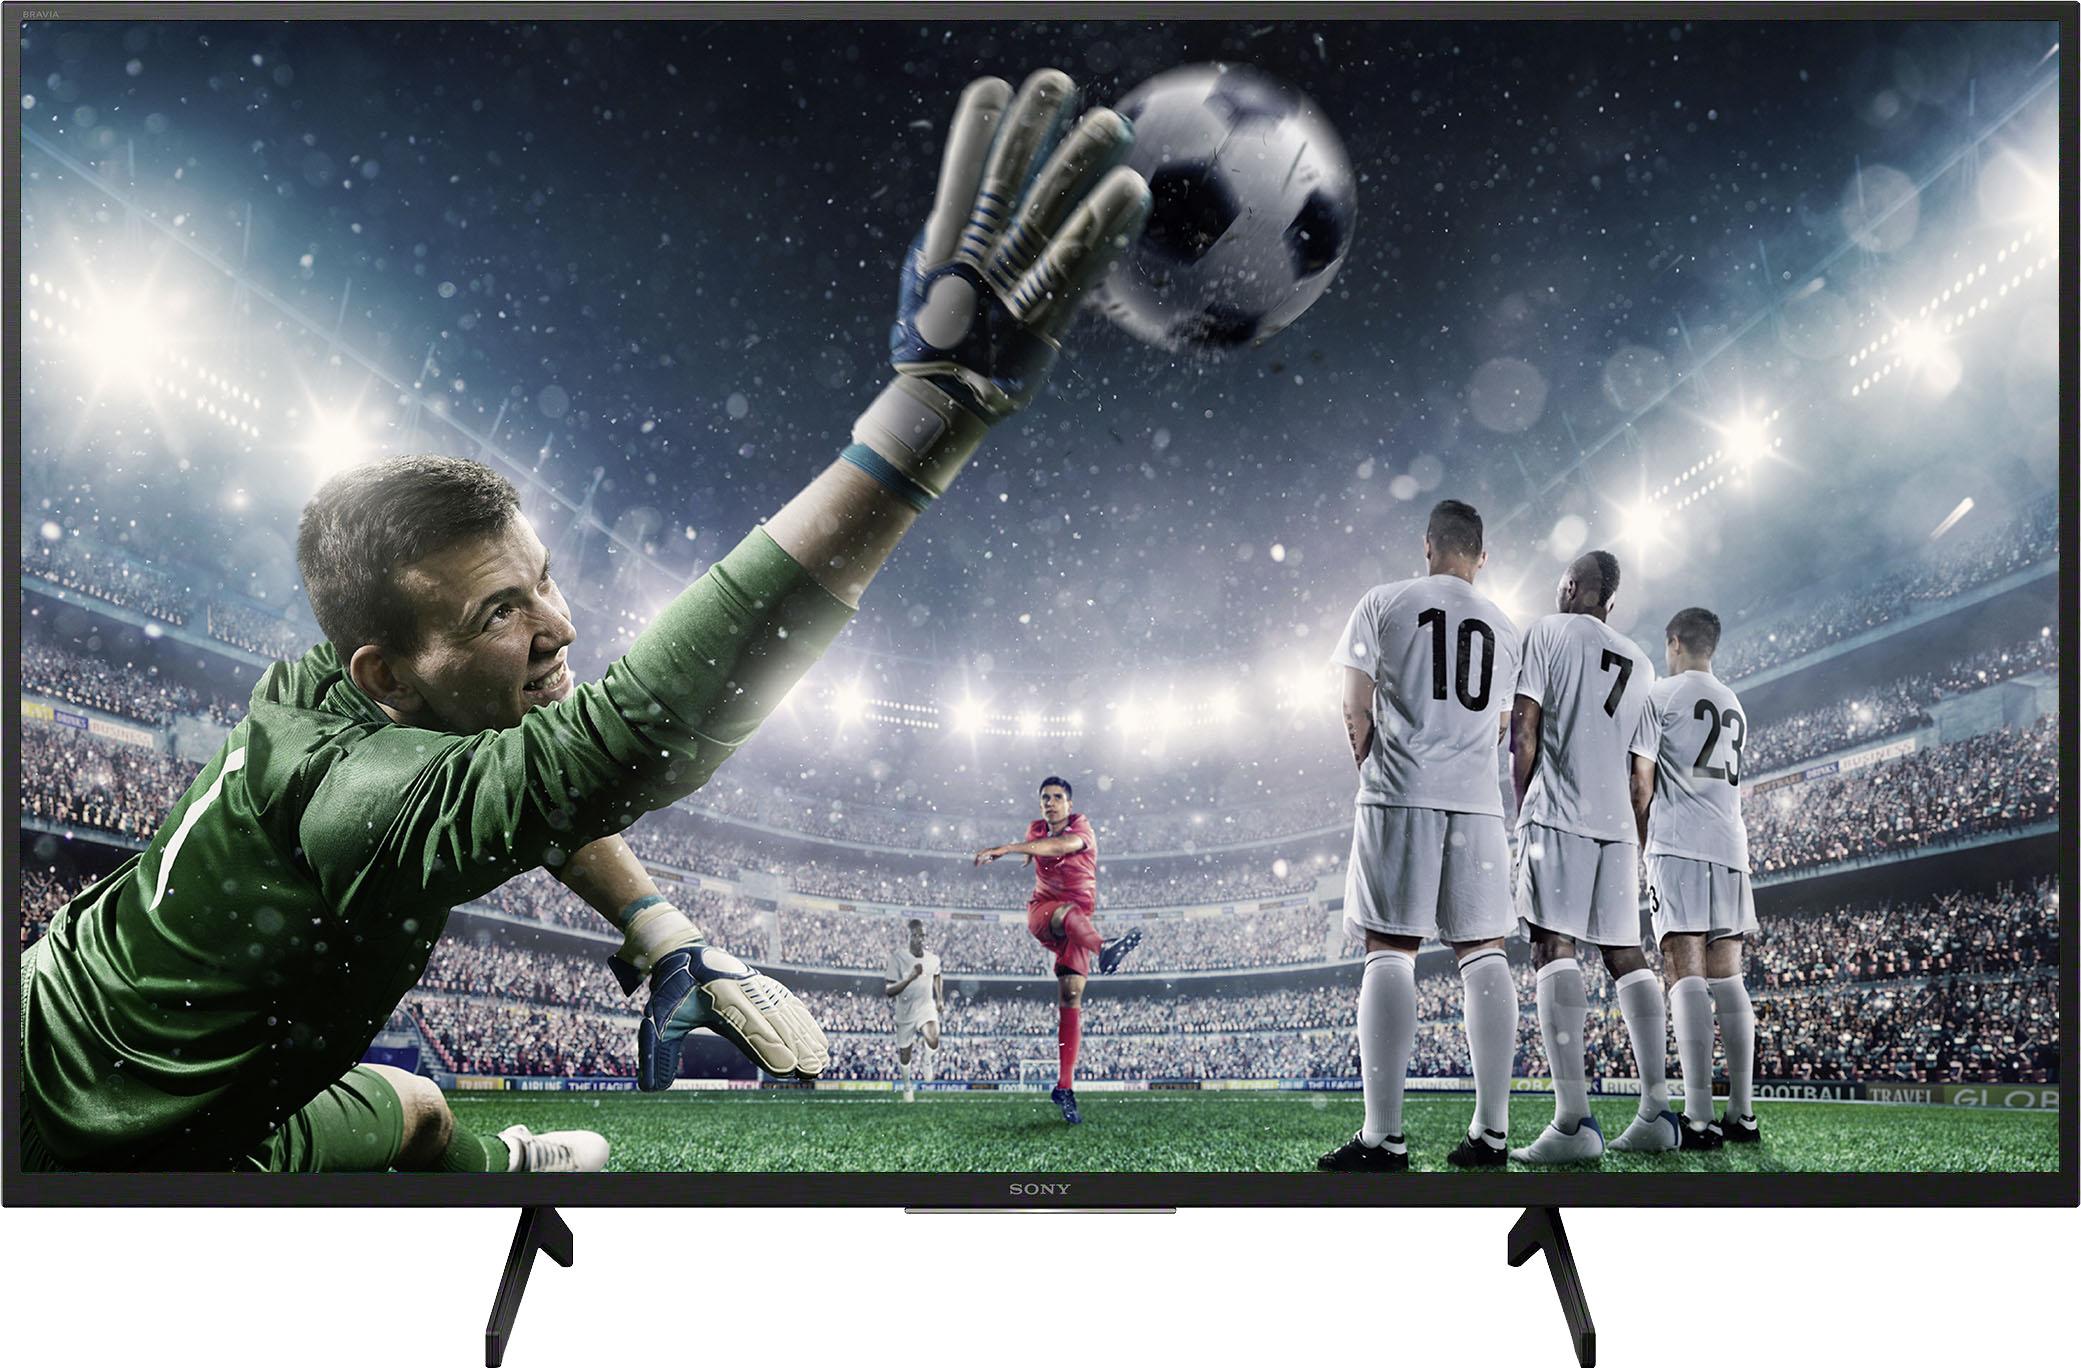 Sony LED-Fernseher KD-49XH8096 Bravia , 123 cm 49 , 4K Ultra HD, Android TV-Smart-TV